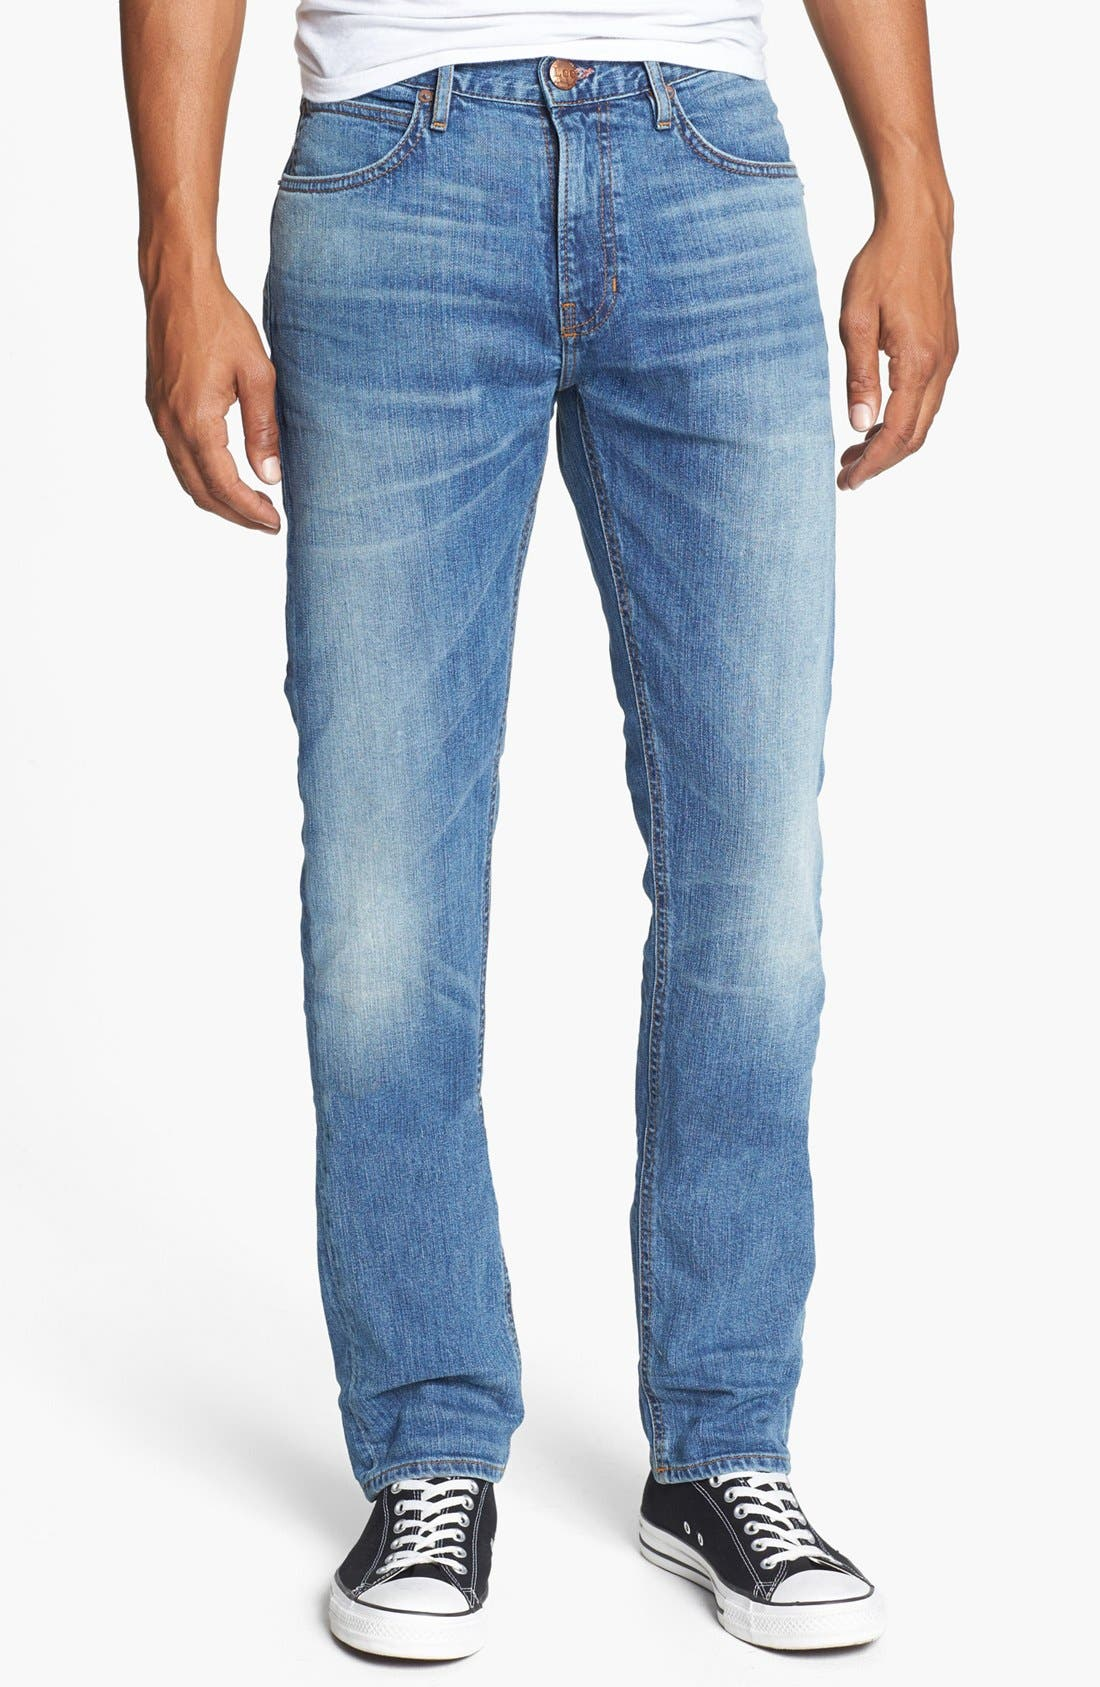 Main Image - Lee 101 USA Lean Straight Leg Jeans (Dry Dust)